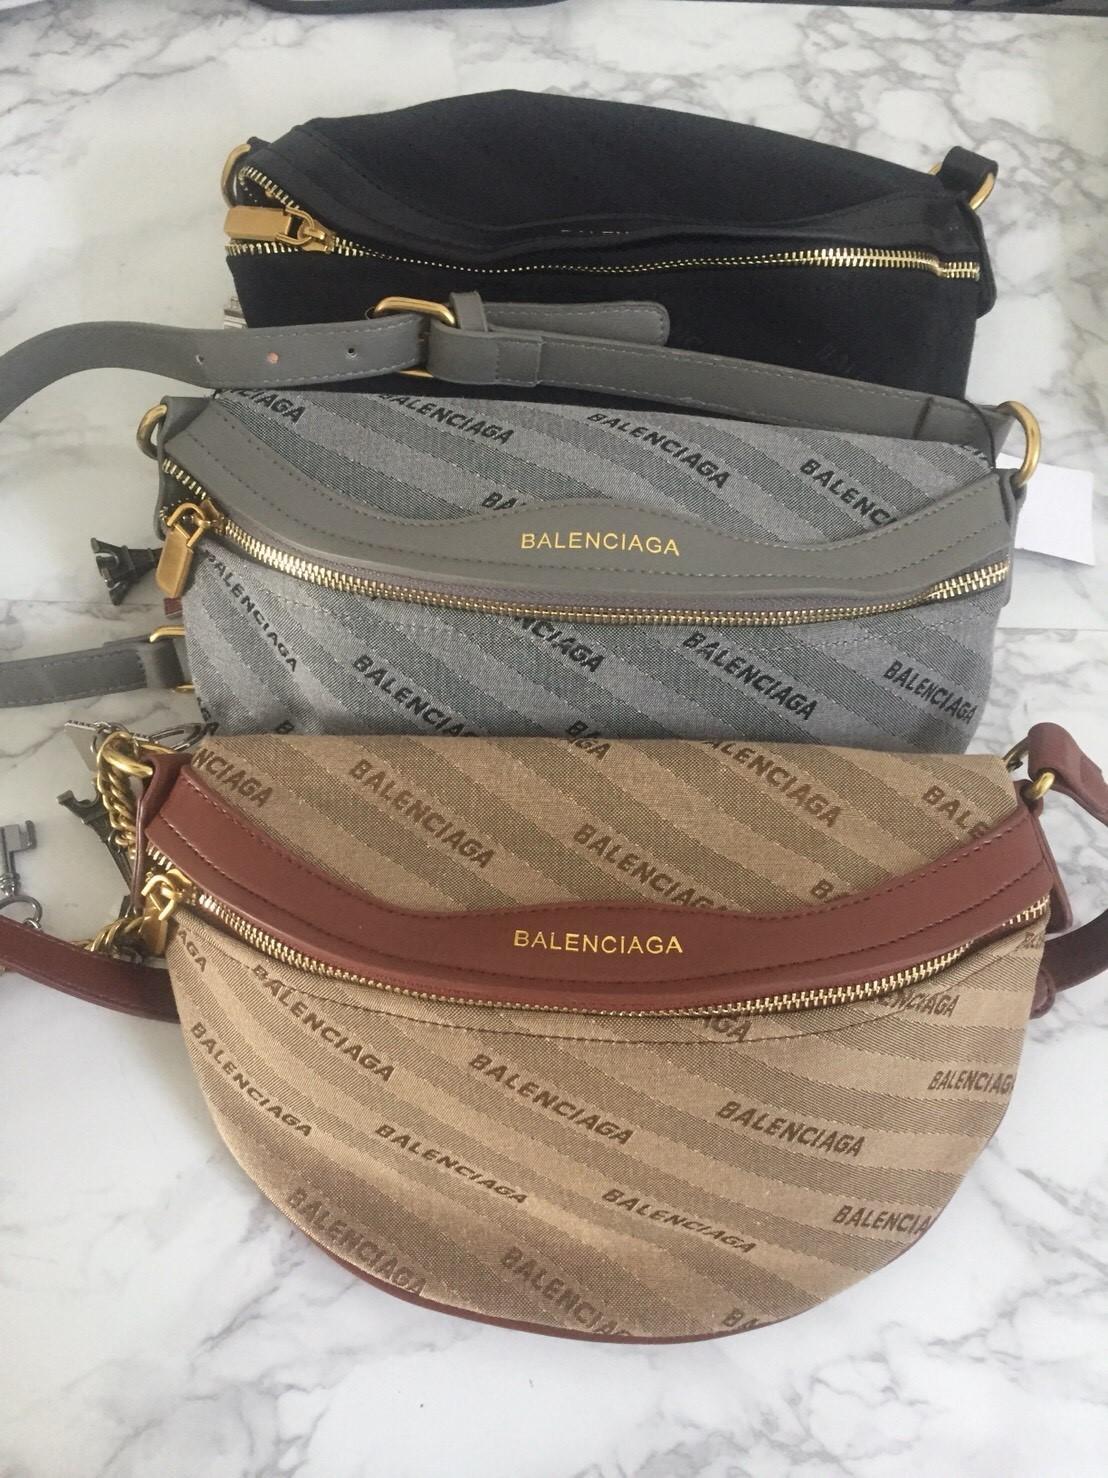 Promo Tas Wanita Balenciaga Belt Bag Waist Bag Waistbag Sling Bag Belt Bag Impor Import Harga Murah Diskon Sale Obral Keren Best Seller Kece New Arrival Cantik Bagus Rapi Kuat Bagus